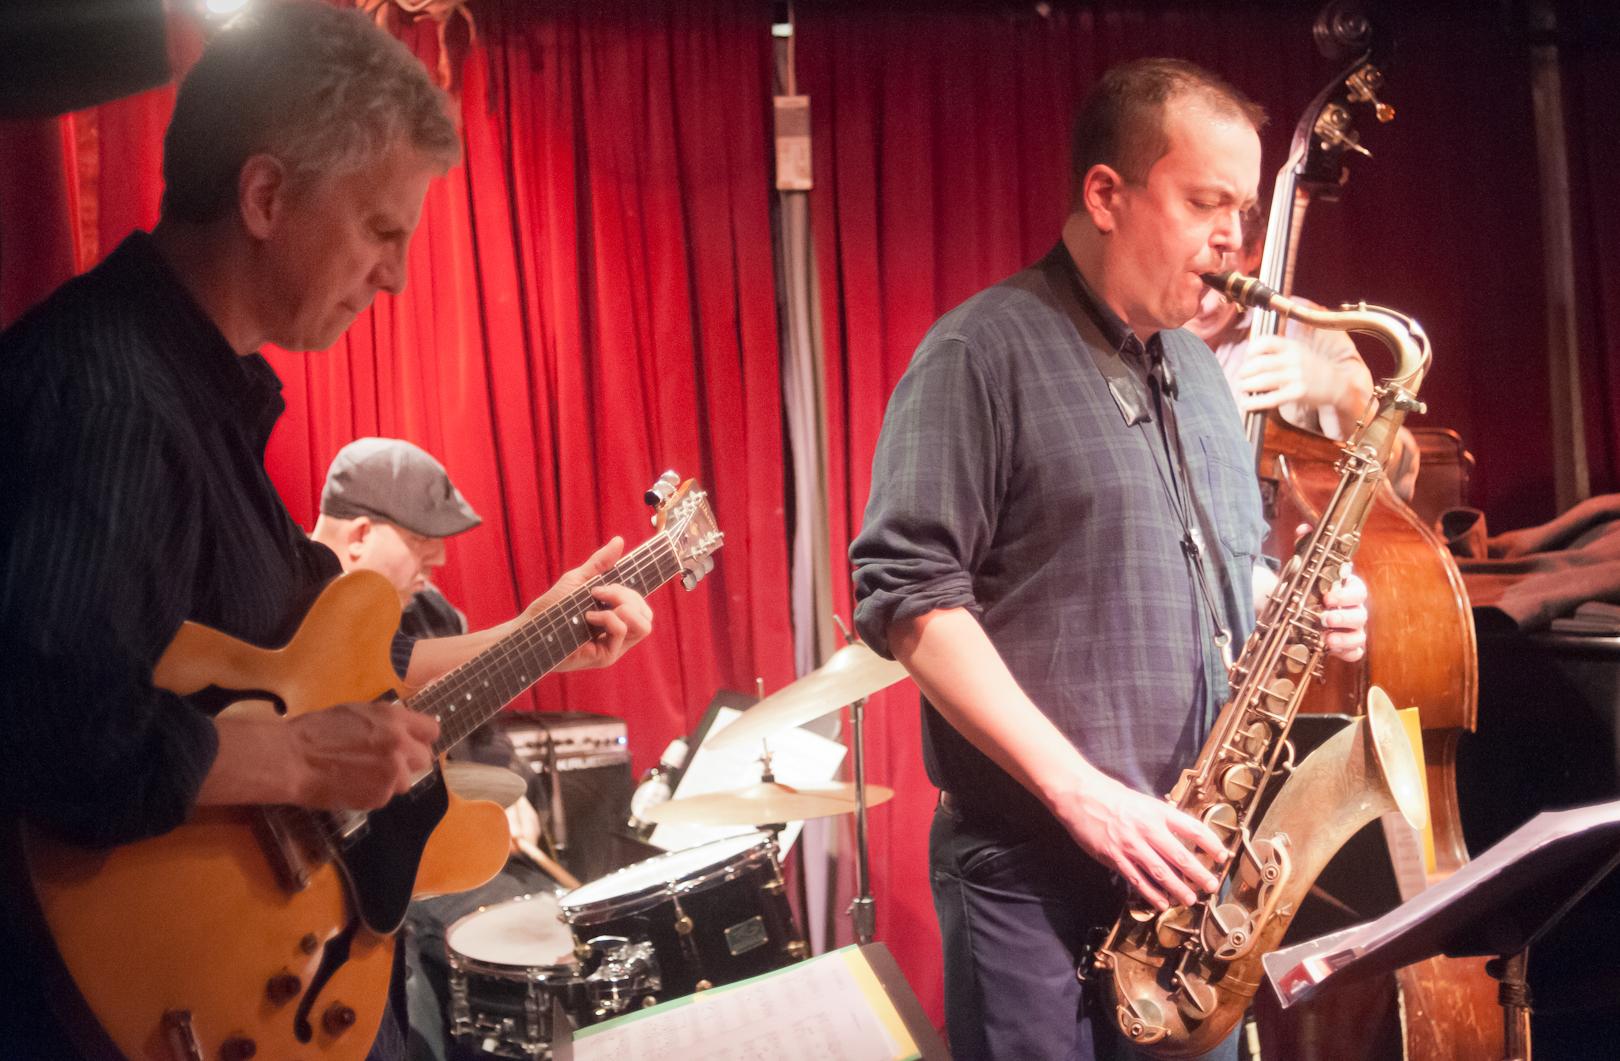 Steve Cardenas, Diego Voglino, Bill McHenry and Matt Penman with John McNeil and Urban Legends at Cornelia Street Cafe